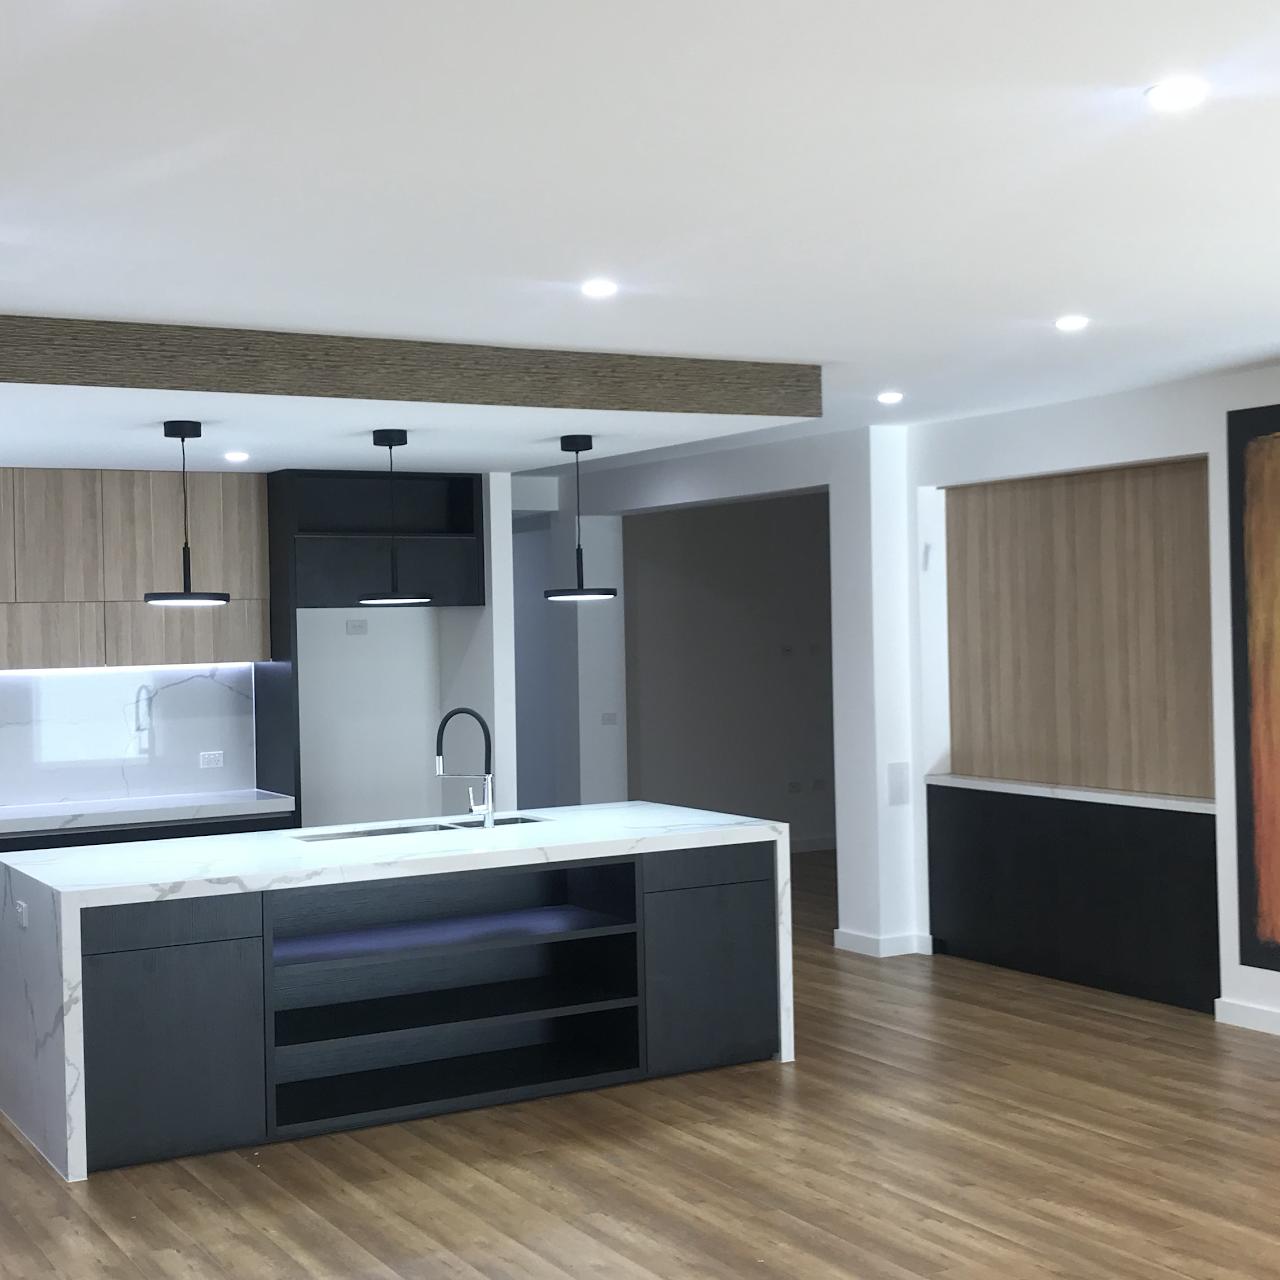 EFE KITCHEN PTY LTD - Kitchen Renovator in Melbourne